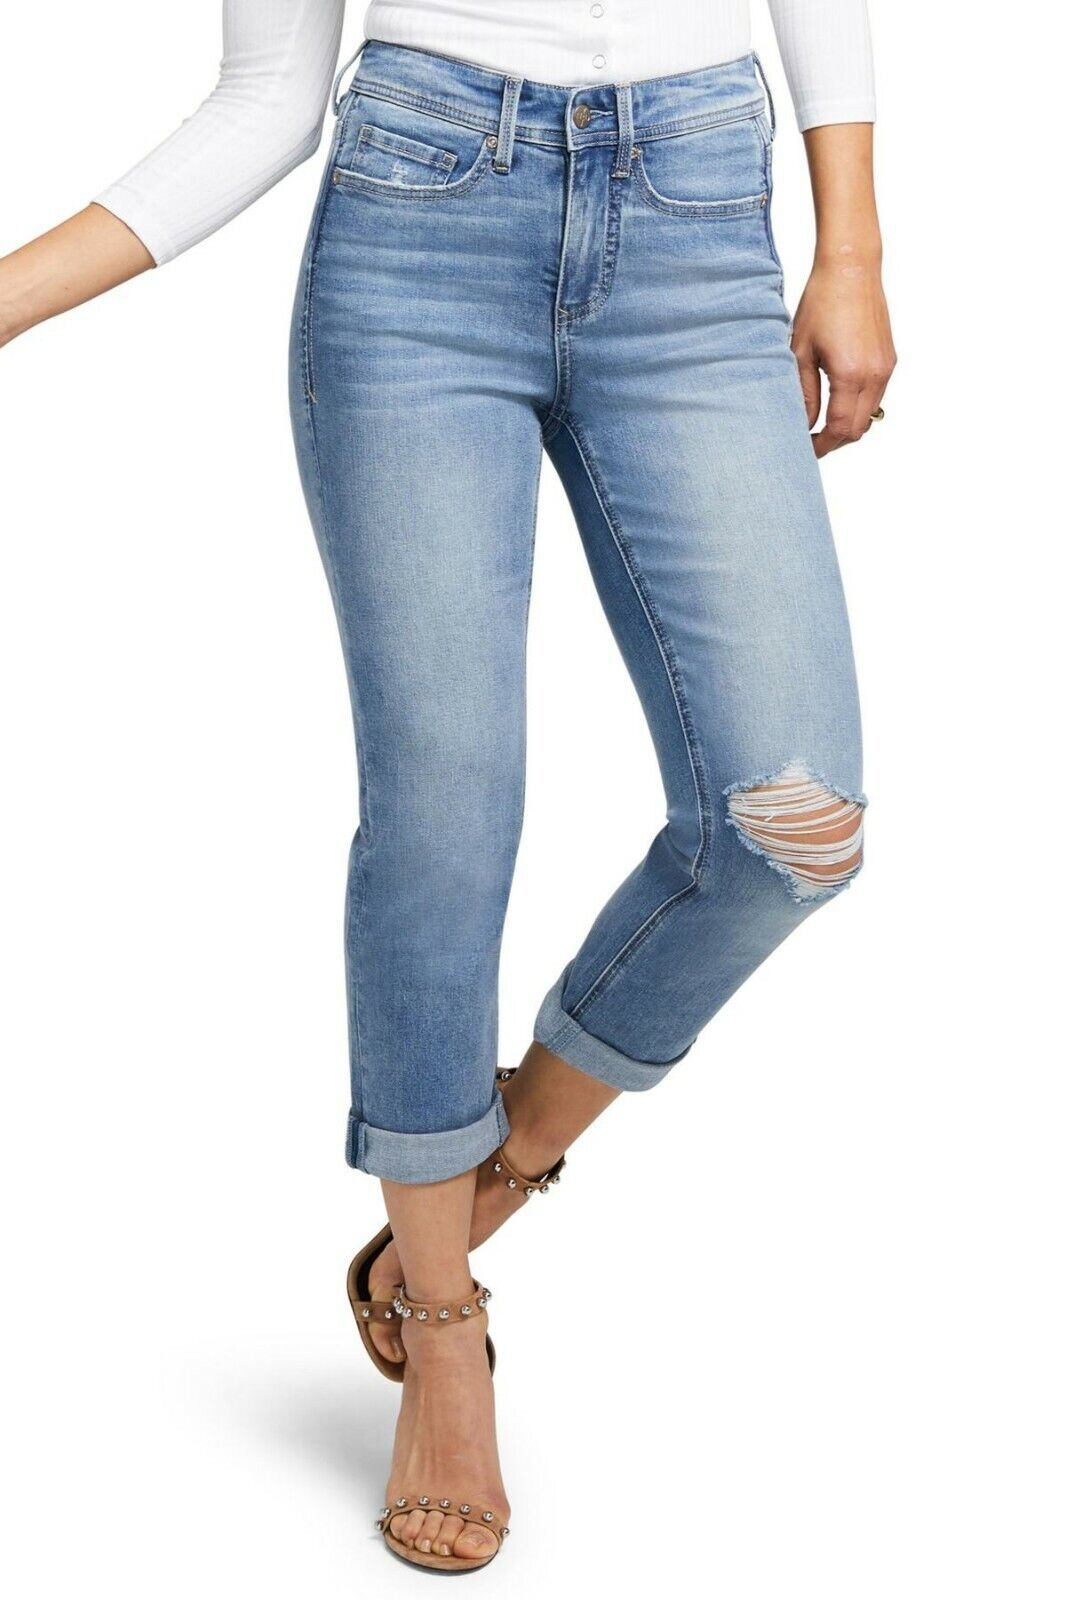 NYDJ Spartan bluee CURVES 360 Shape Slim Straight Distressed Crop Denim Jeans 24W